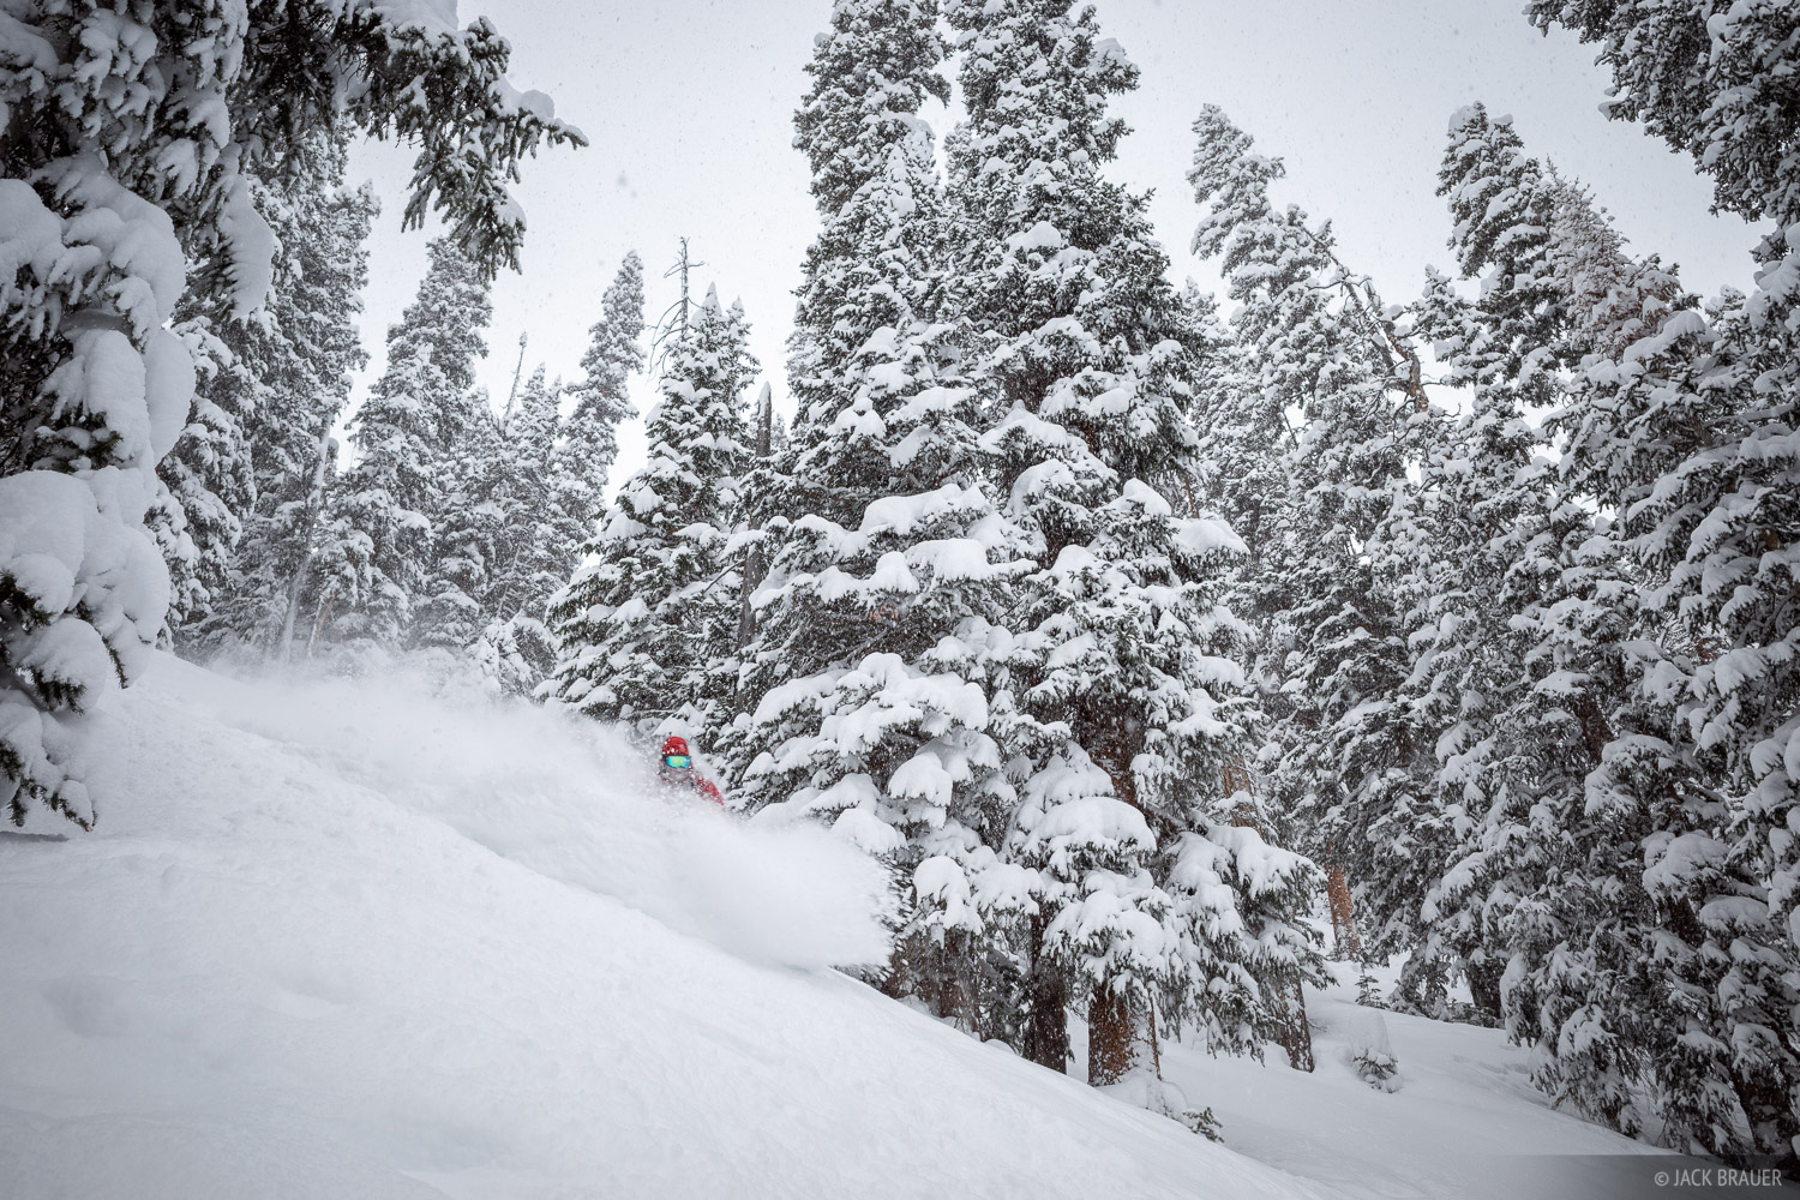 Colorado, Jason Mullins, San Juan Mountains, snowboarding, photo